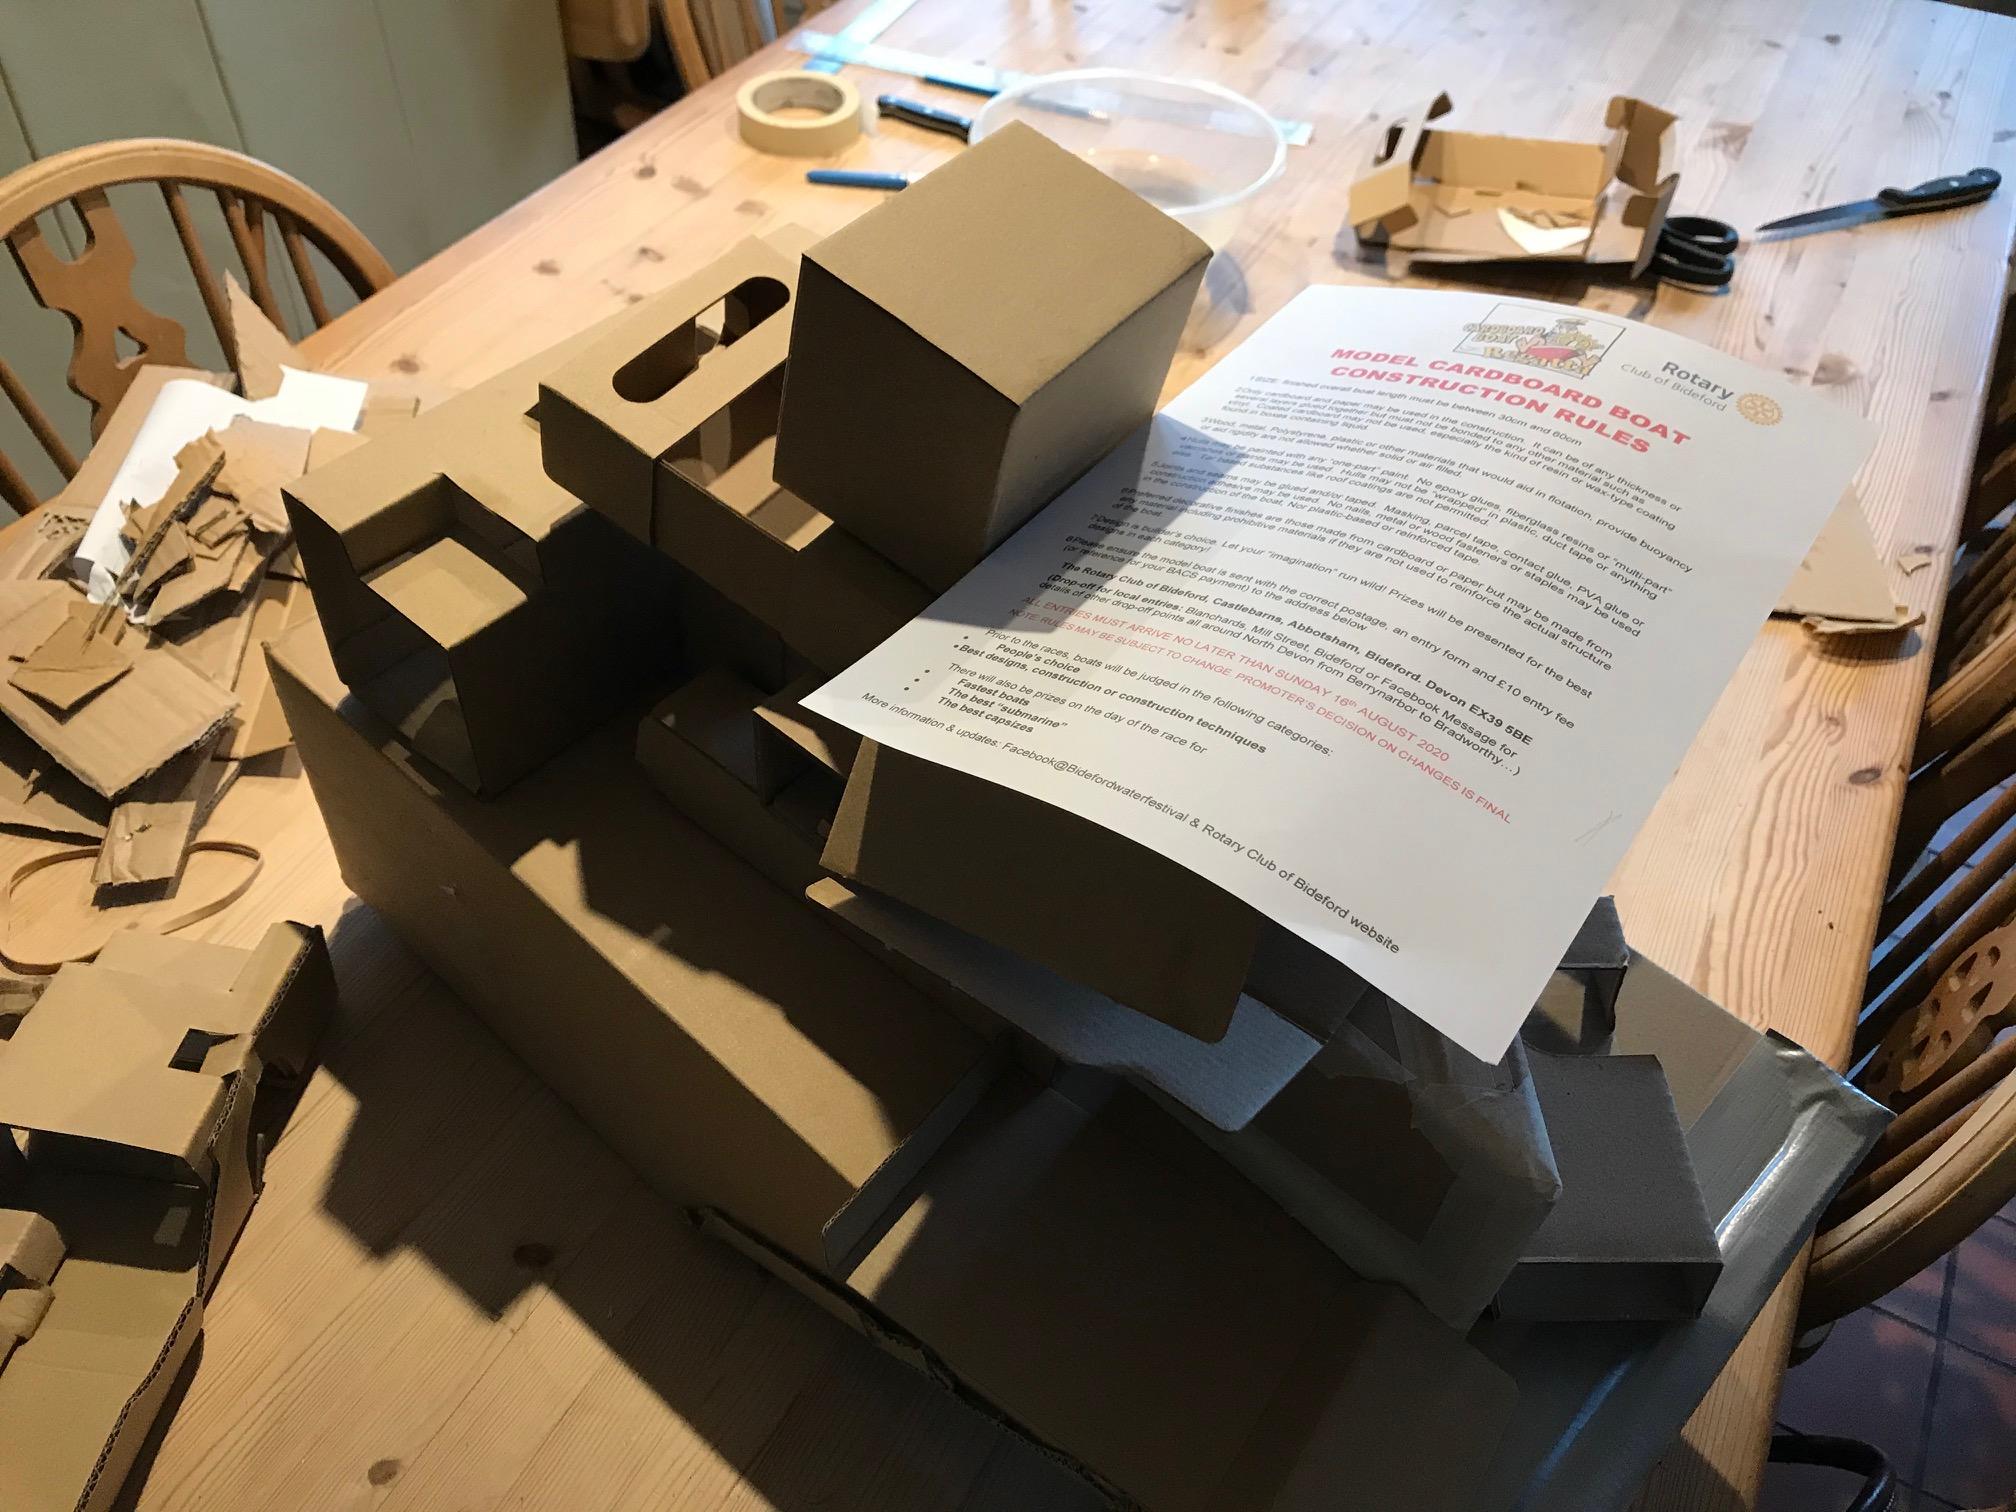 Building Model Cordboard Boats for Bideford Water Festival